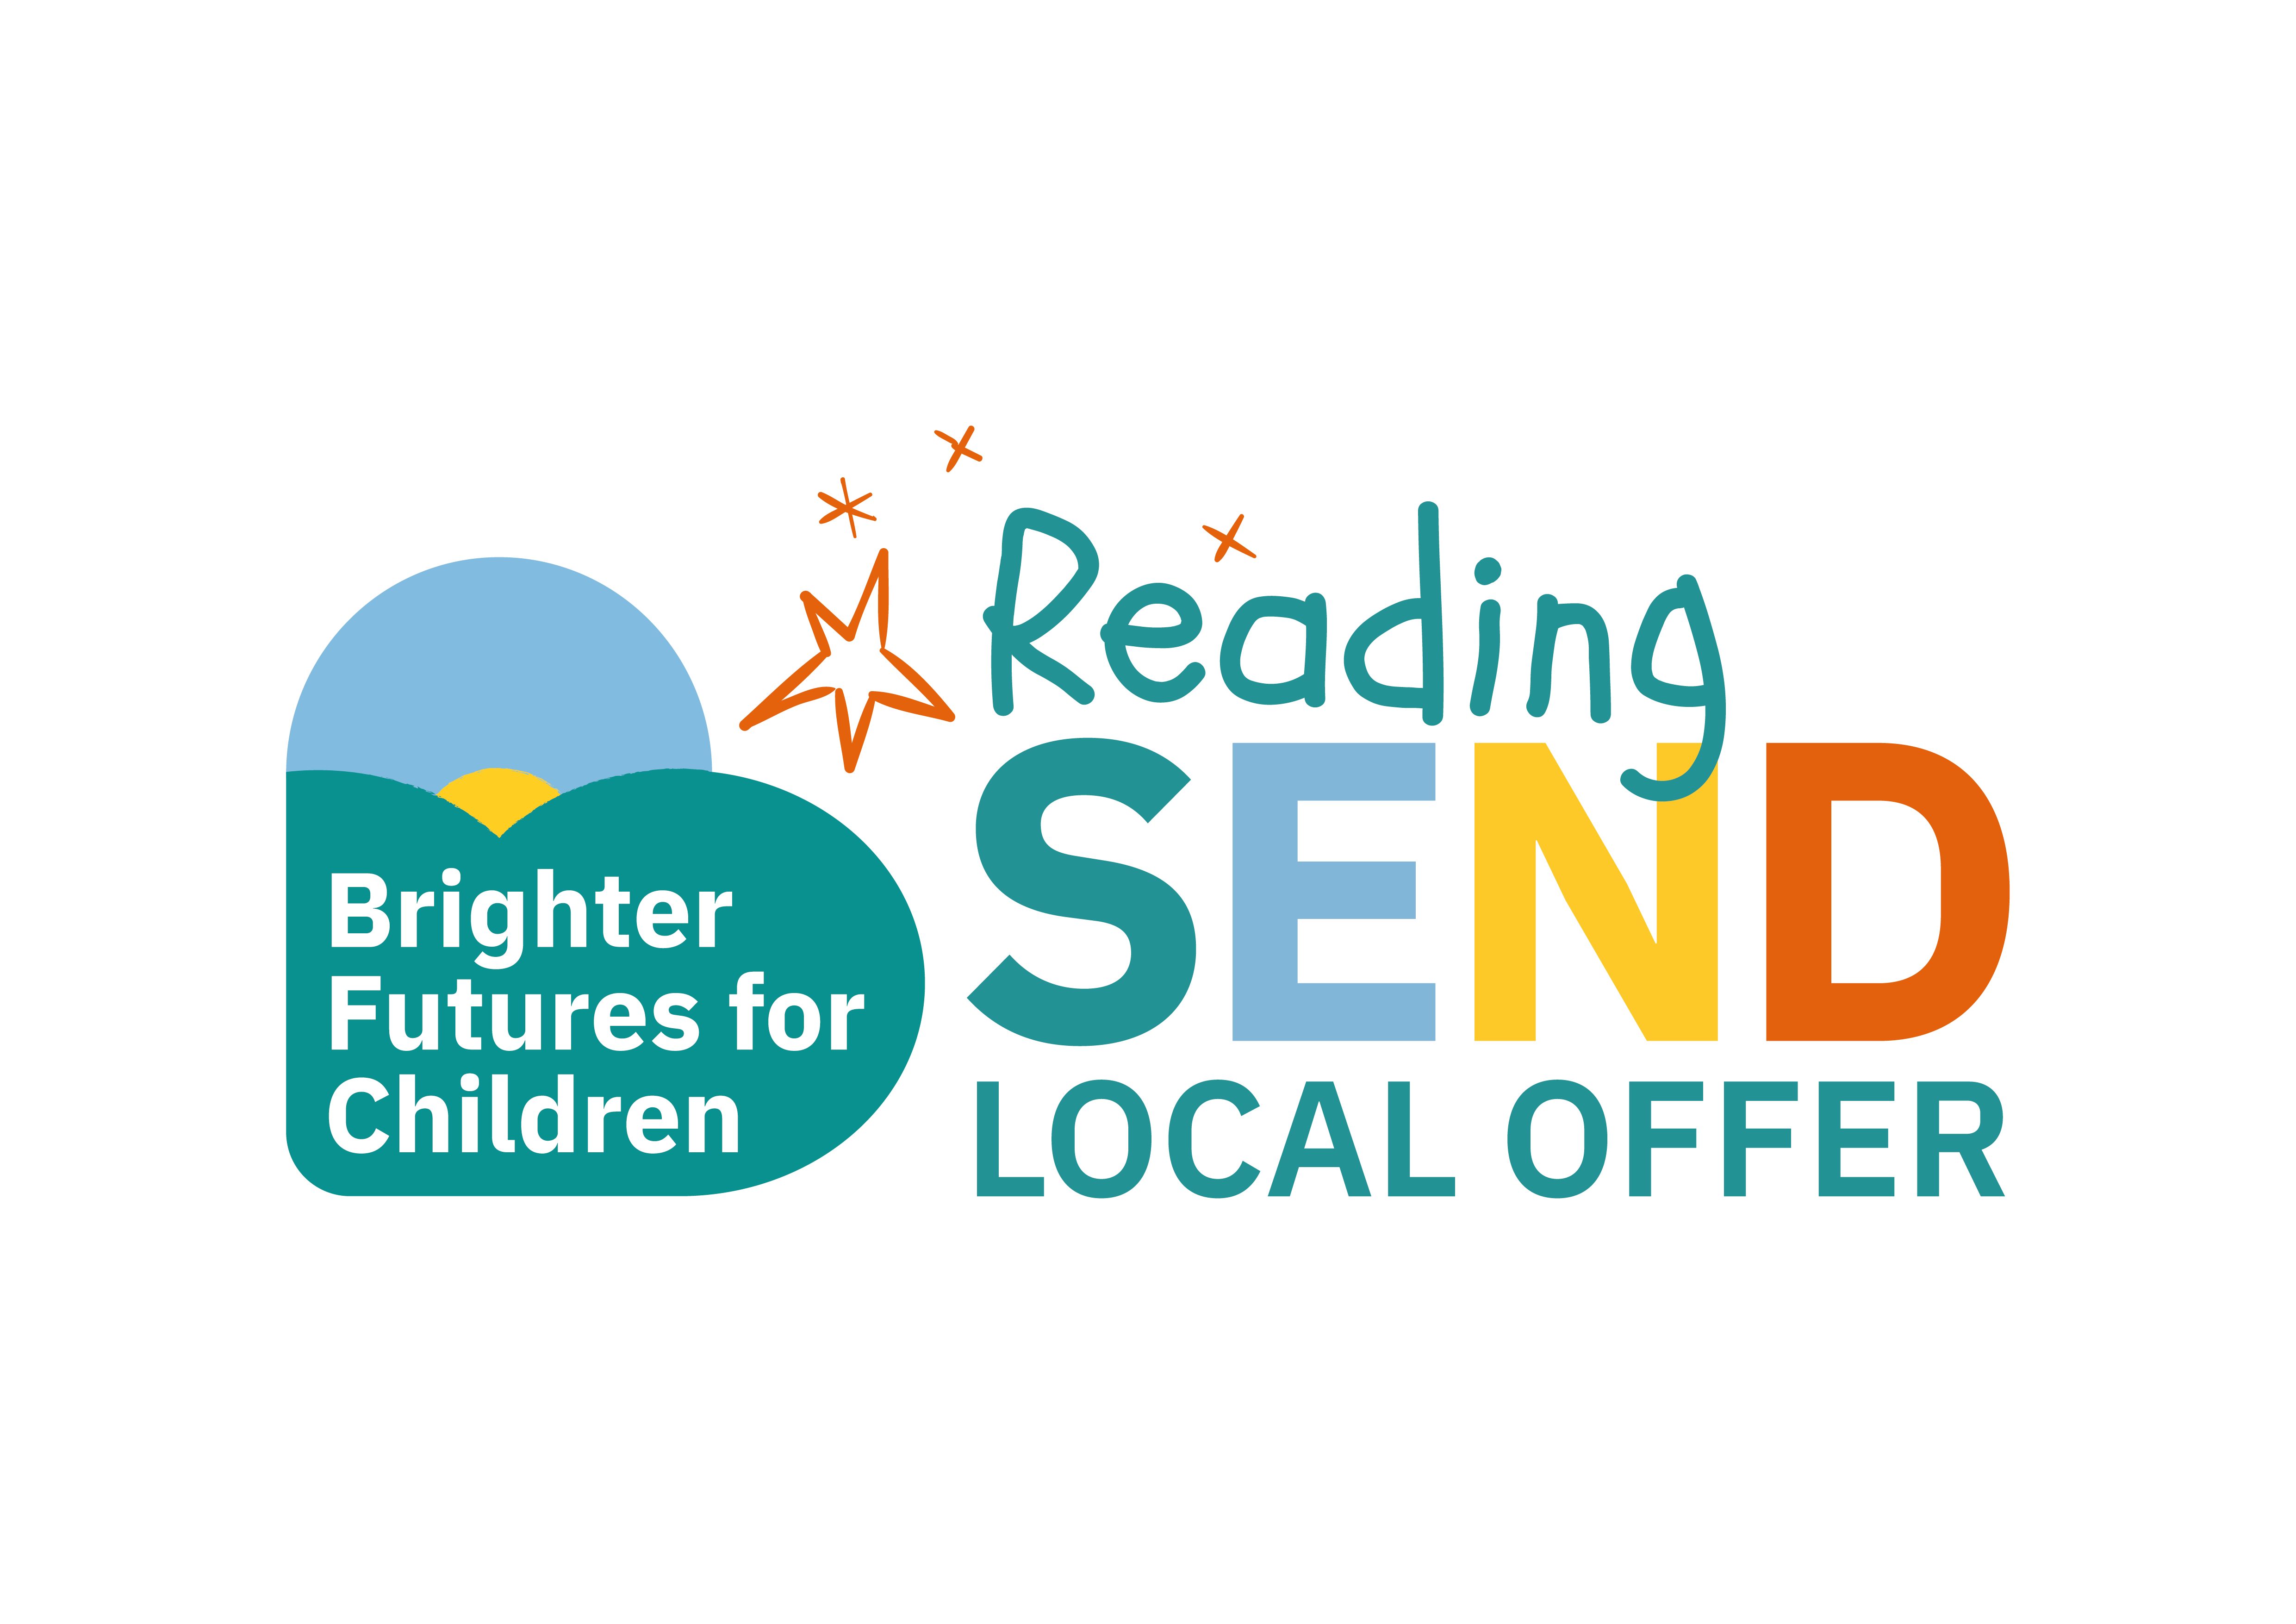 Brighter Futures for Children - Reading SEND Local Offer logo